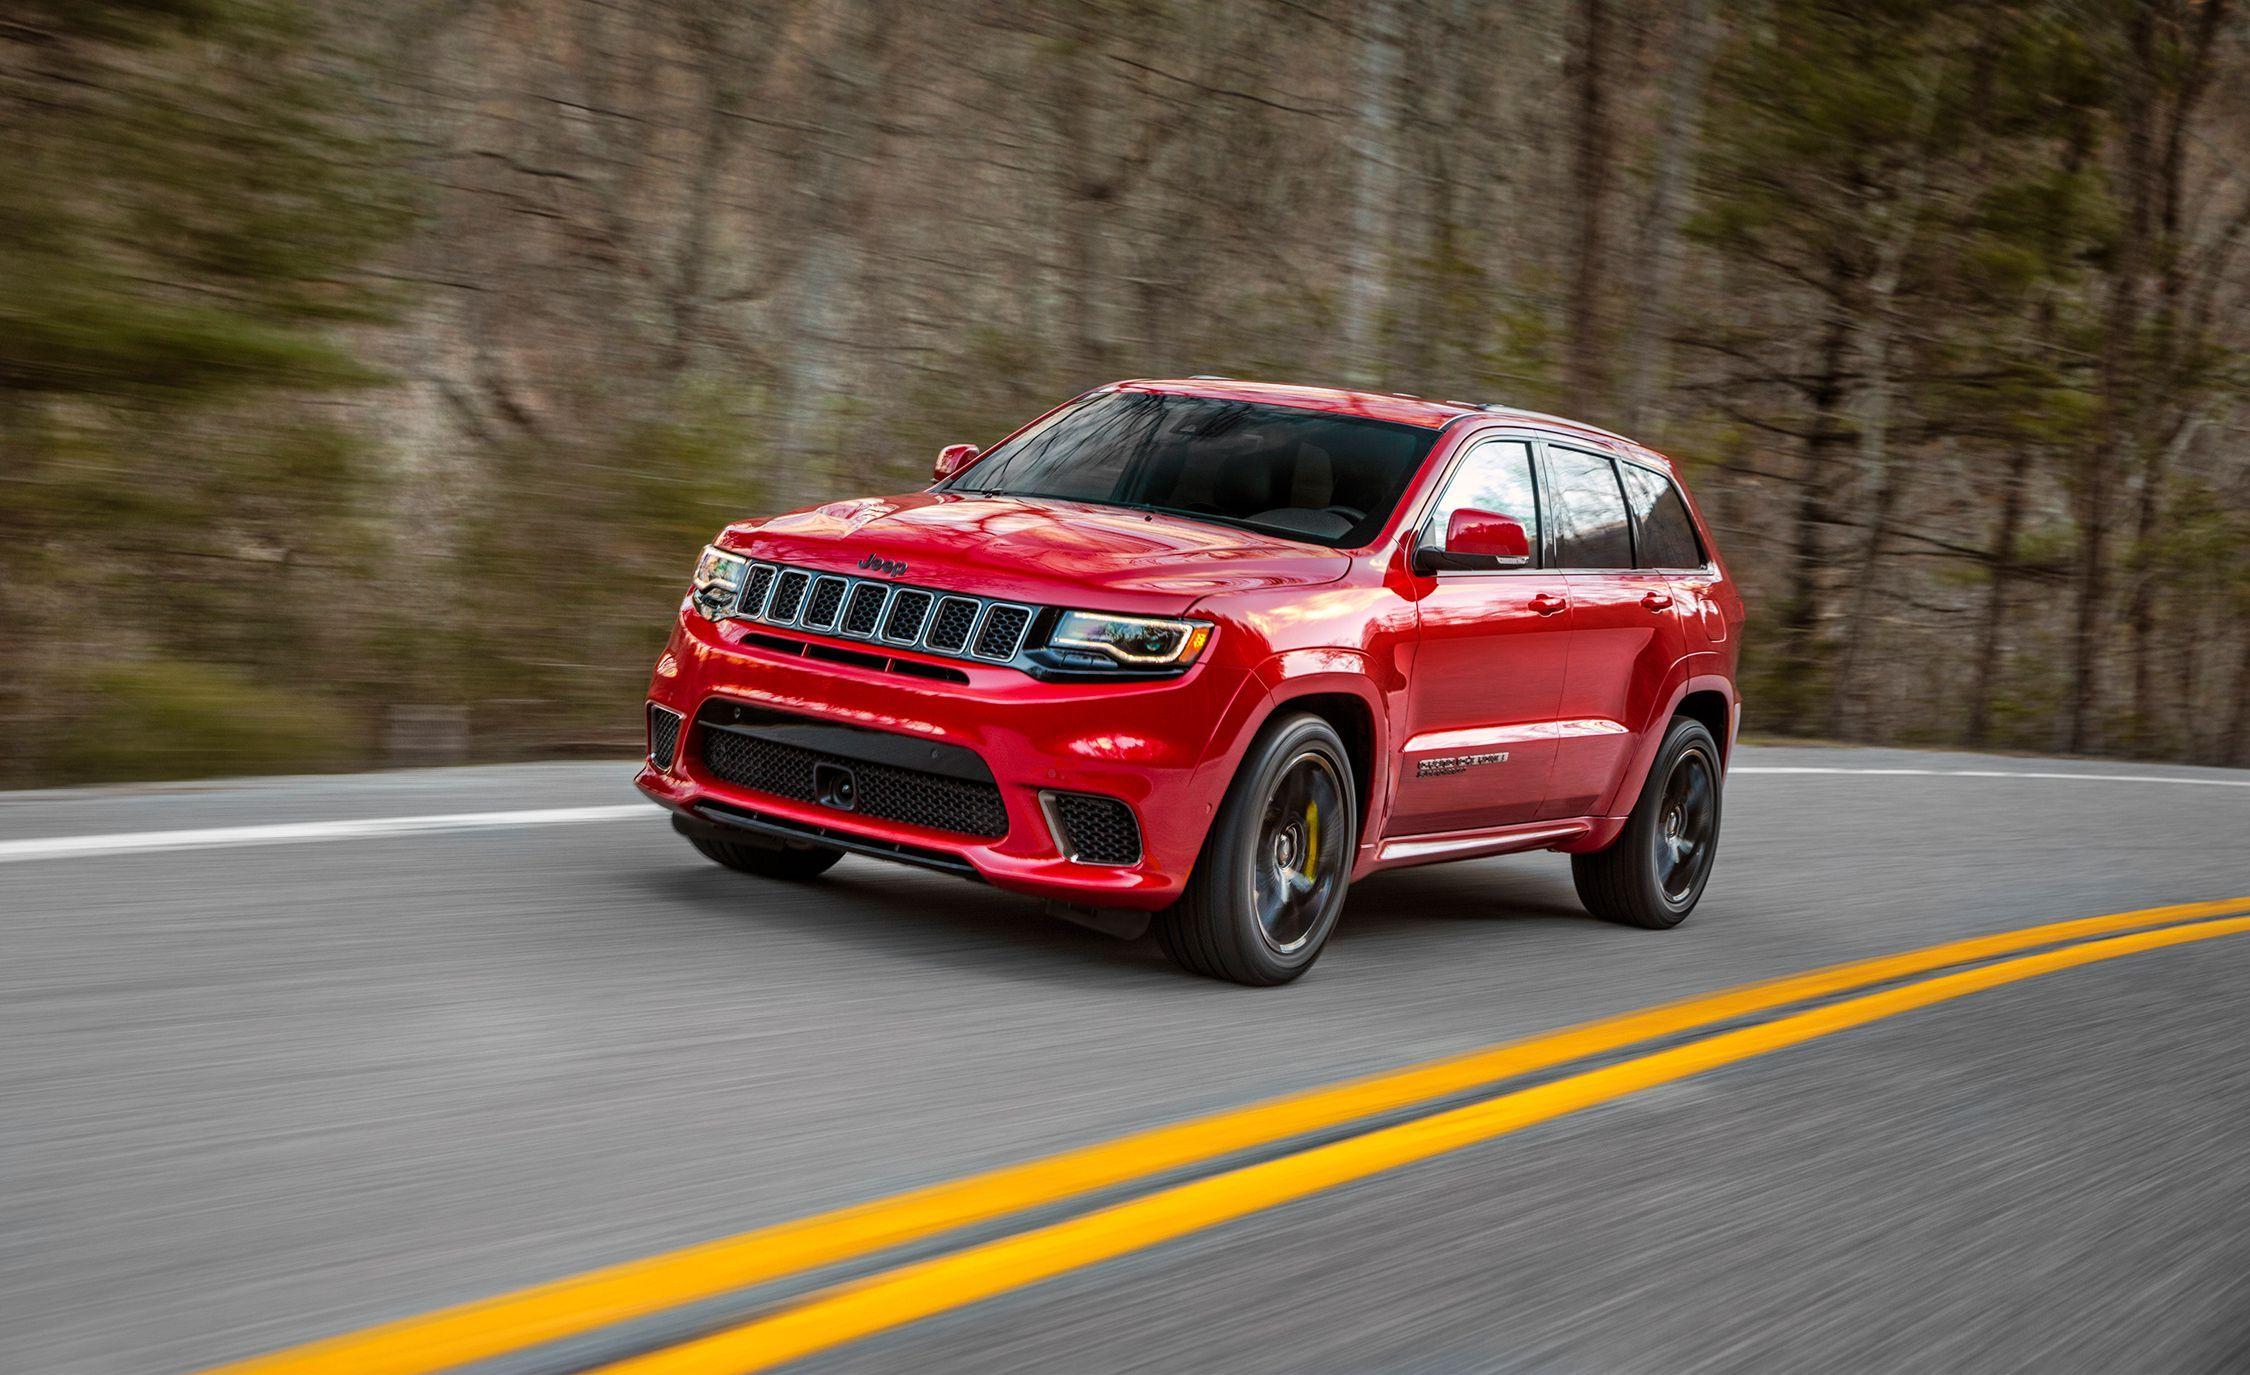 2018 Jeep Grand Cherokee Trackhawk The World S Most Powerful Suv